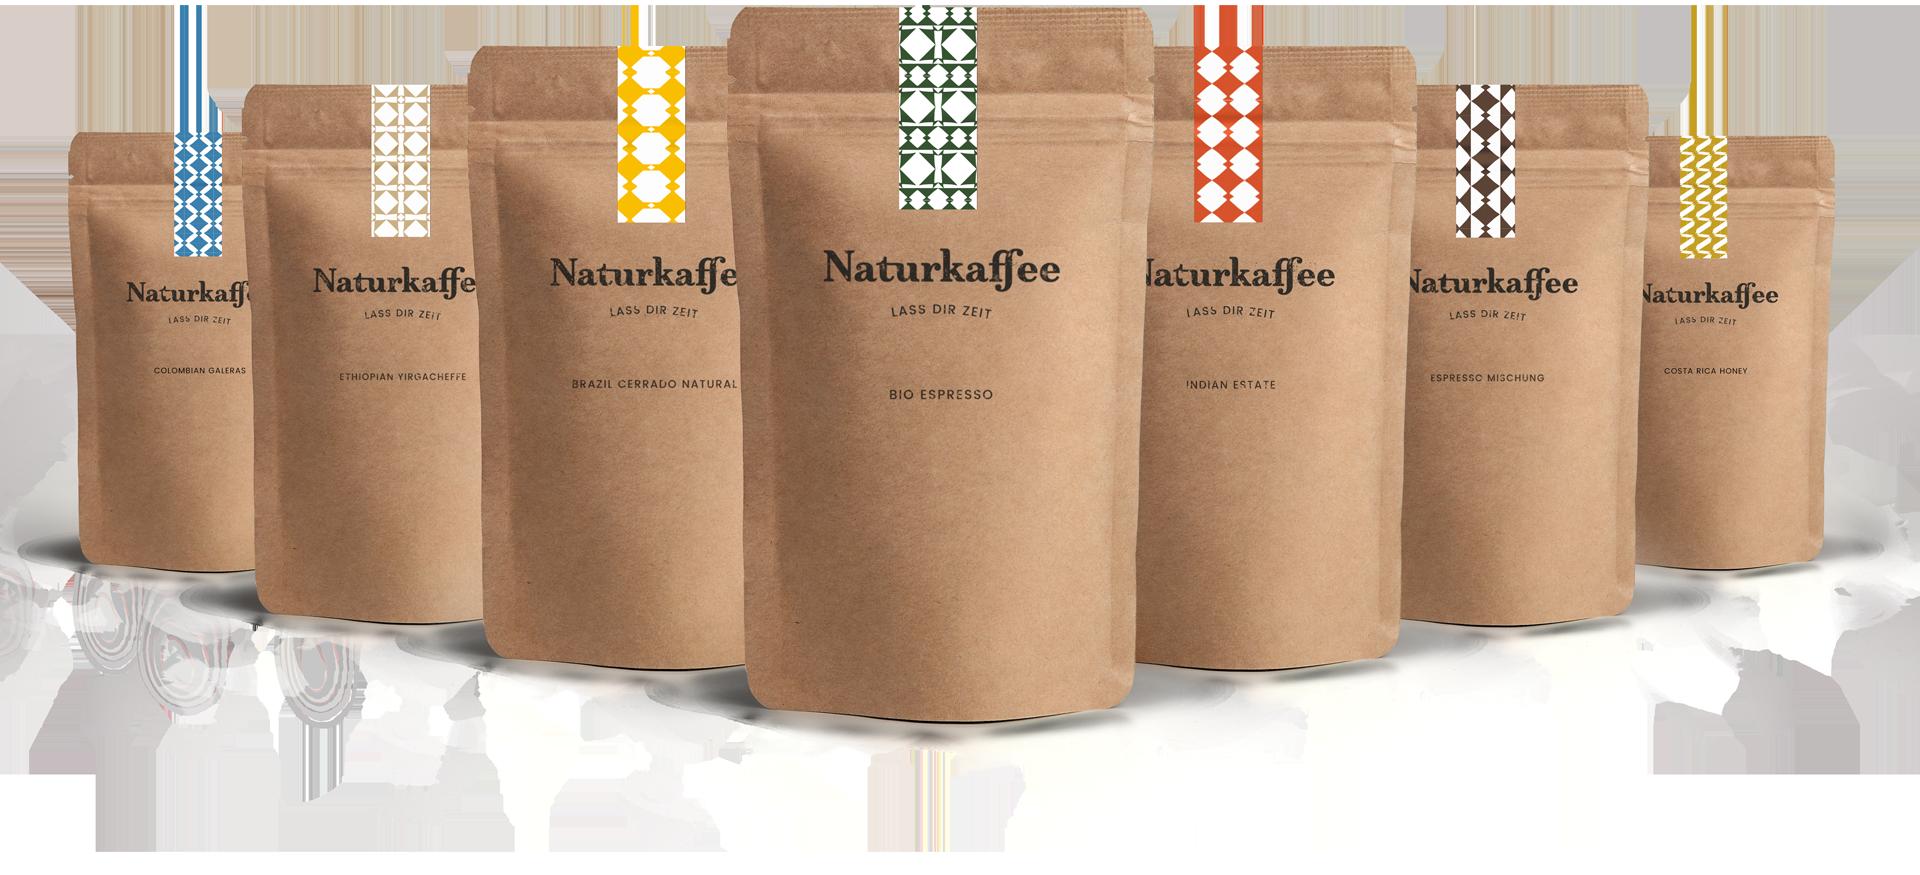 Naturkaffee_Beutel_2019_Alle_front